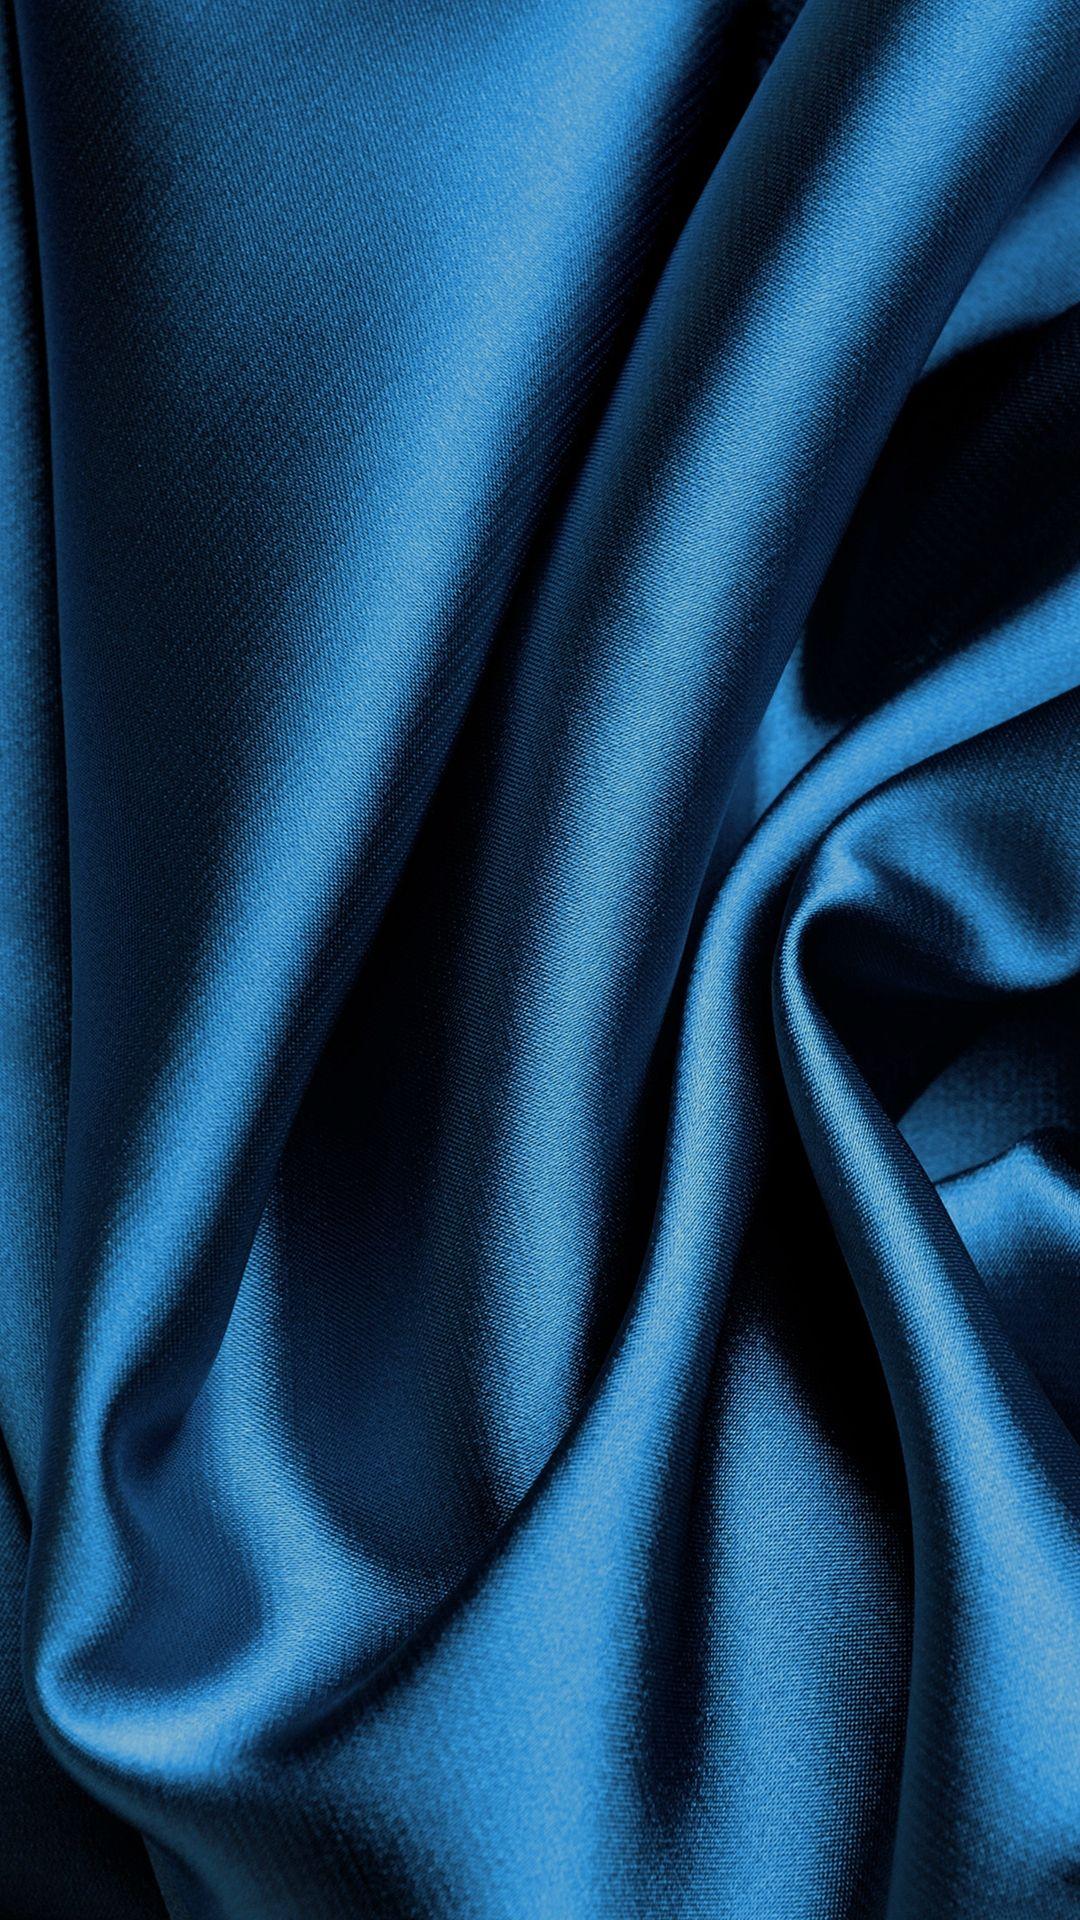 Blue Silk Fabric Texture iPhone 8 Wallpapers Textured